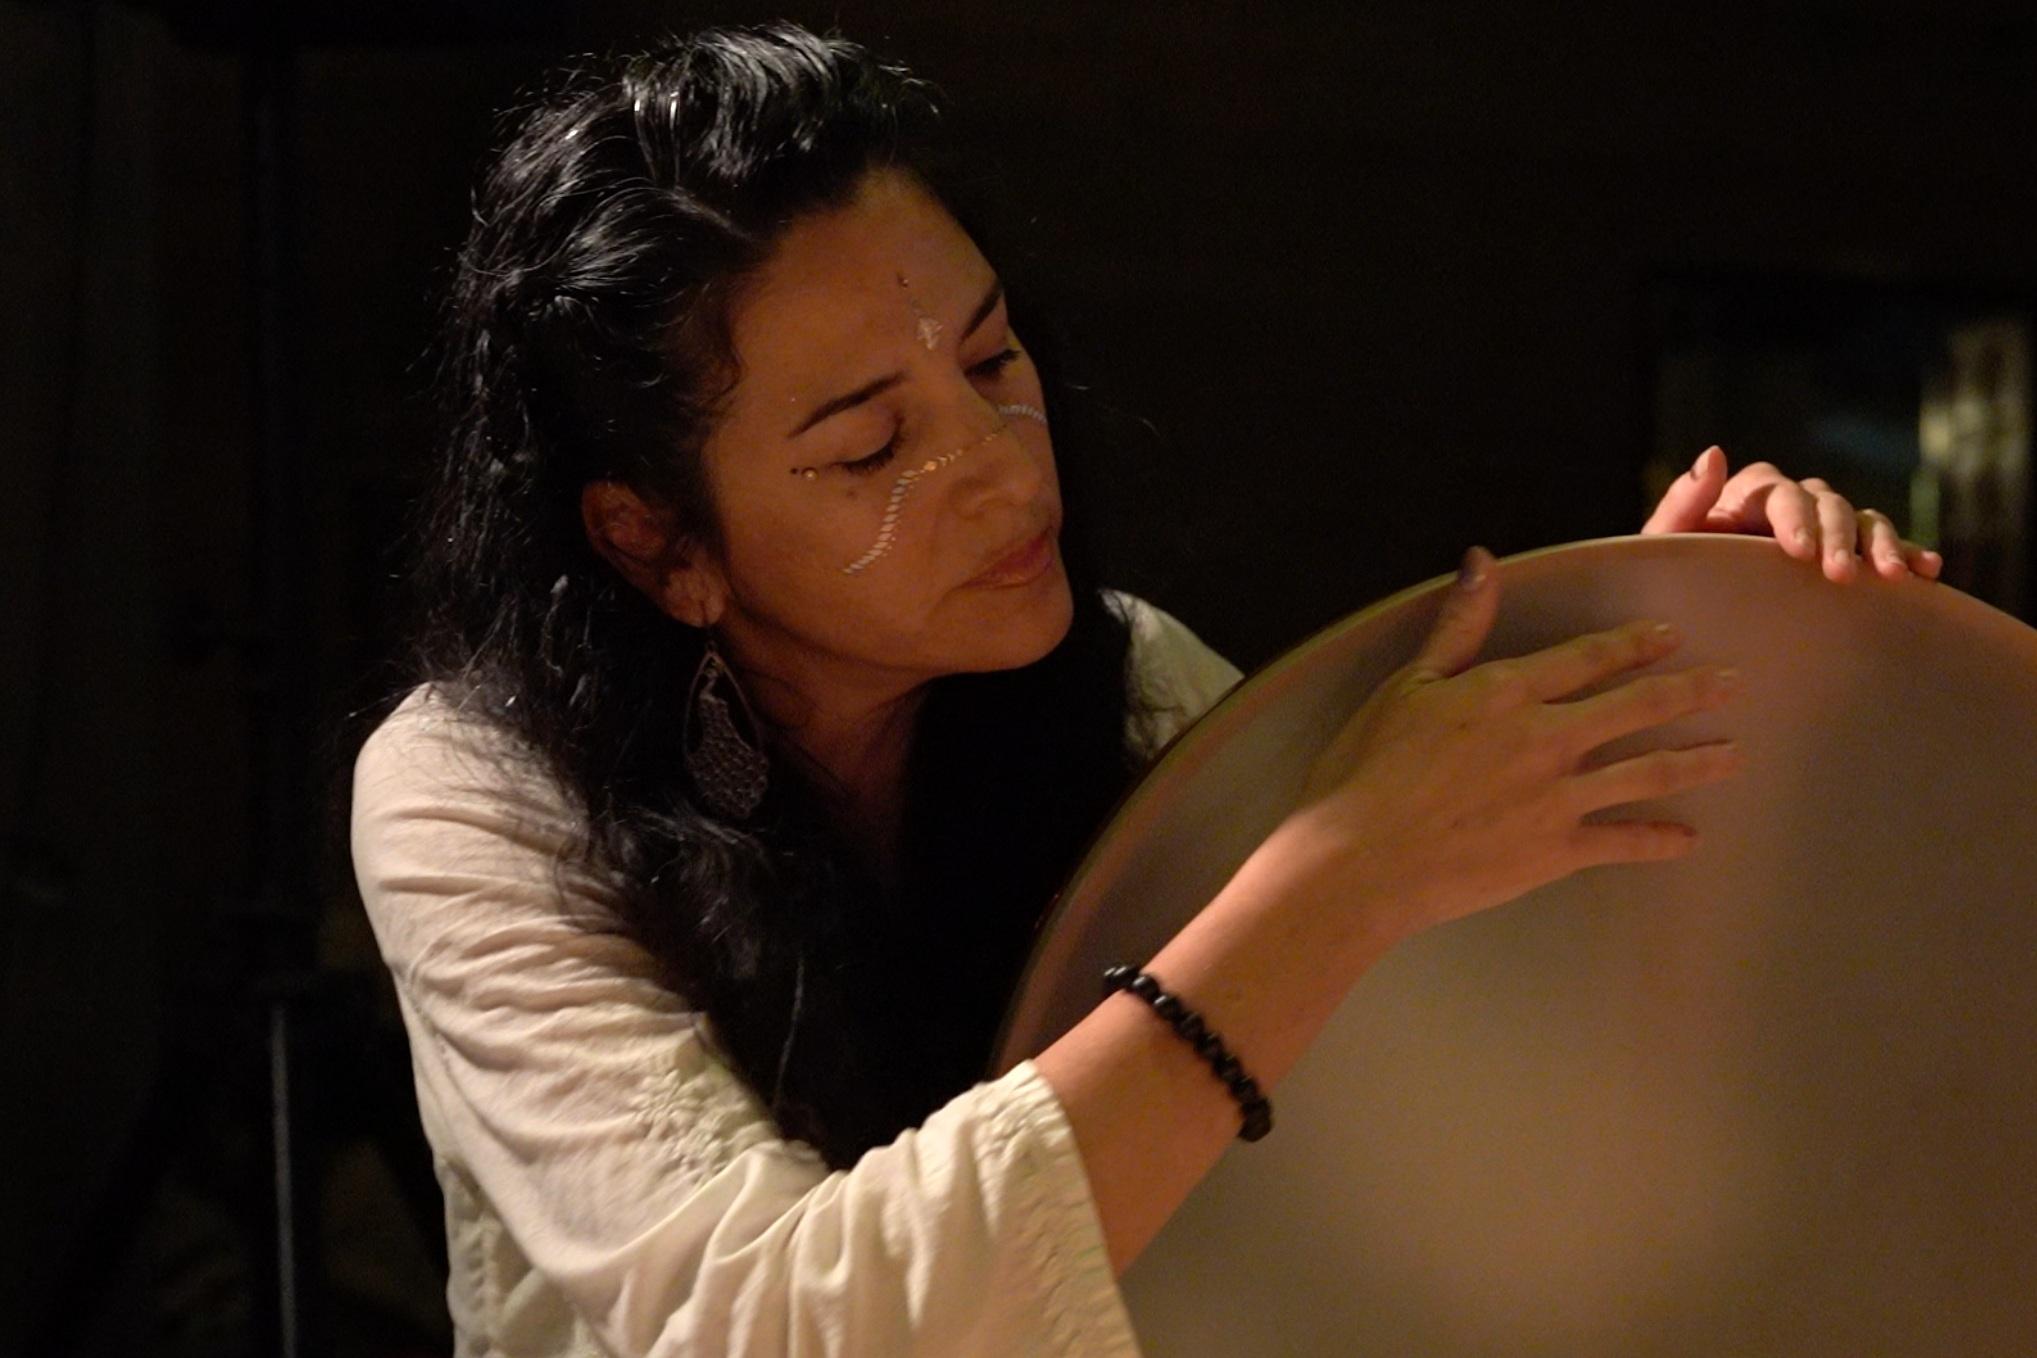 Denise M. Estrada, LAc, MTOM - Devoted Holistic Practitioner, Sound Healerhealingsoundacupuncture.com